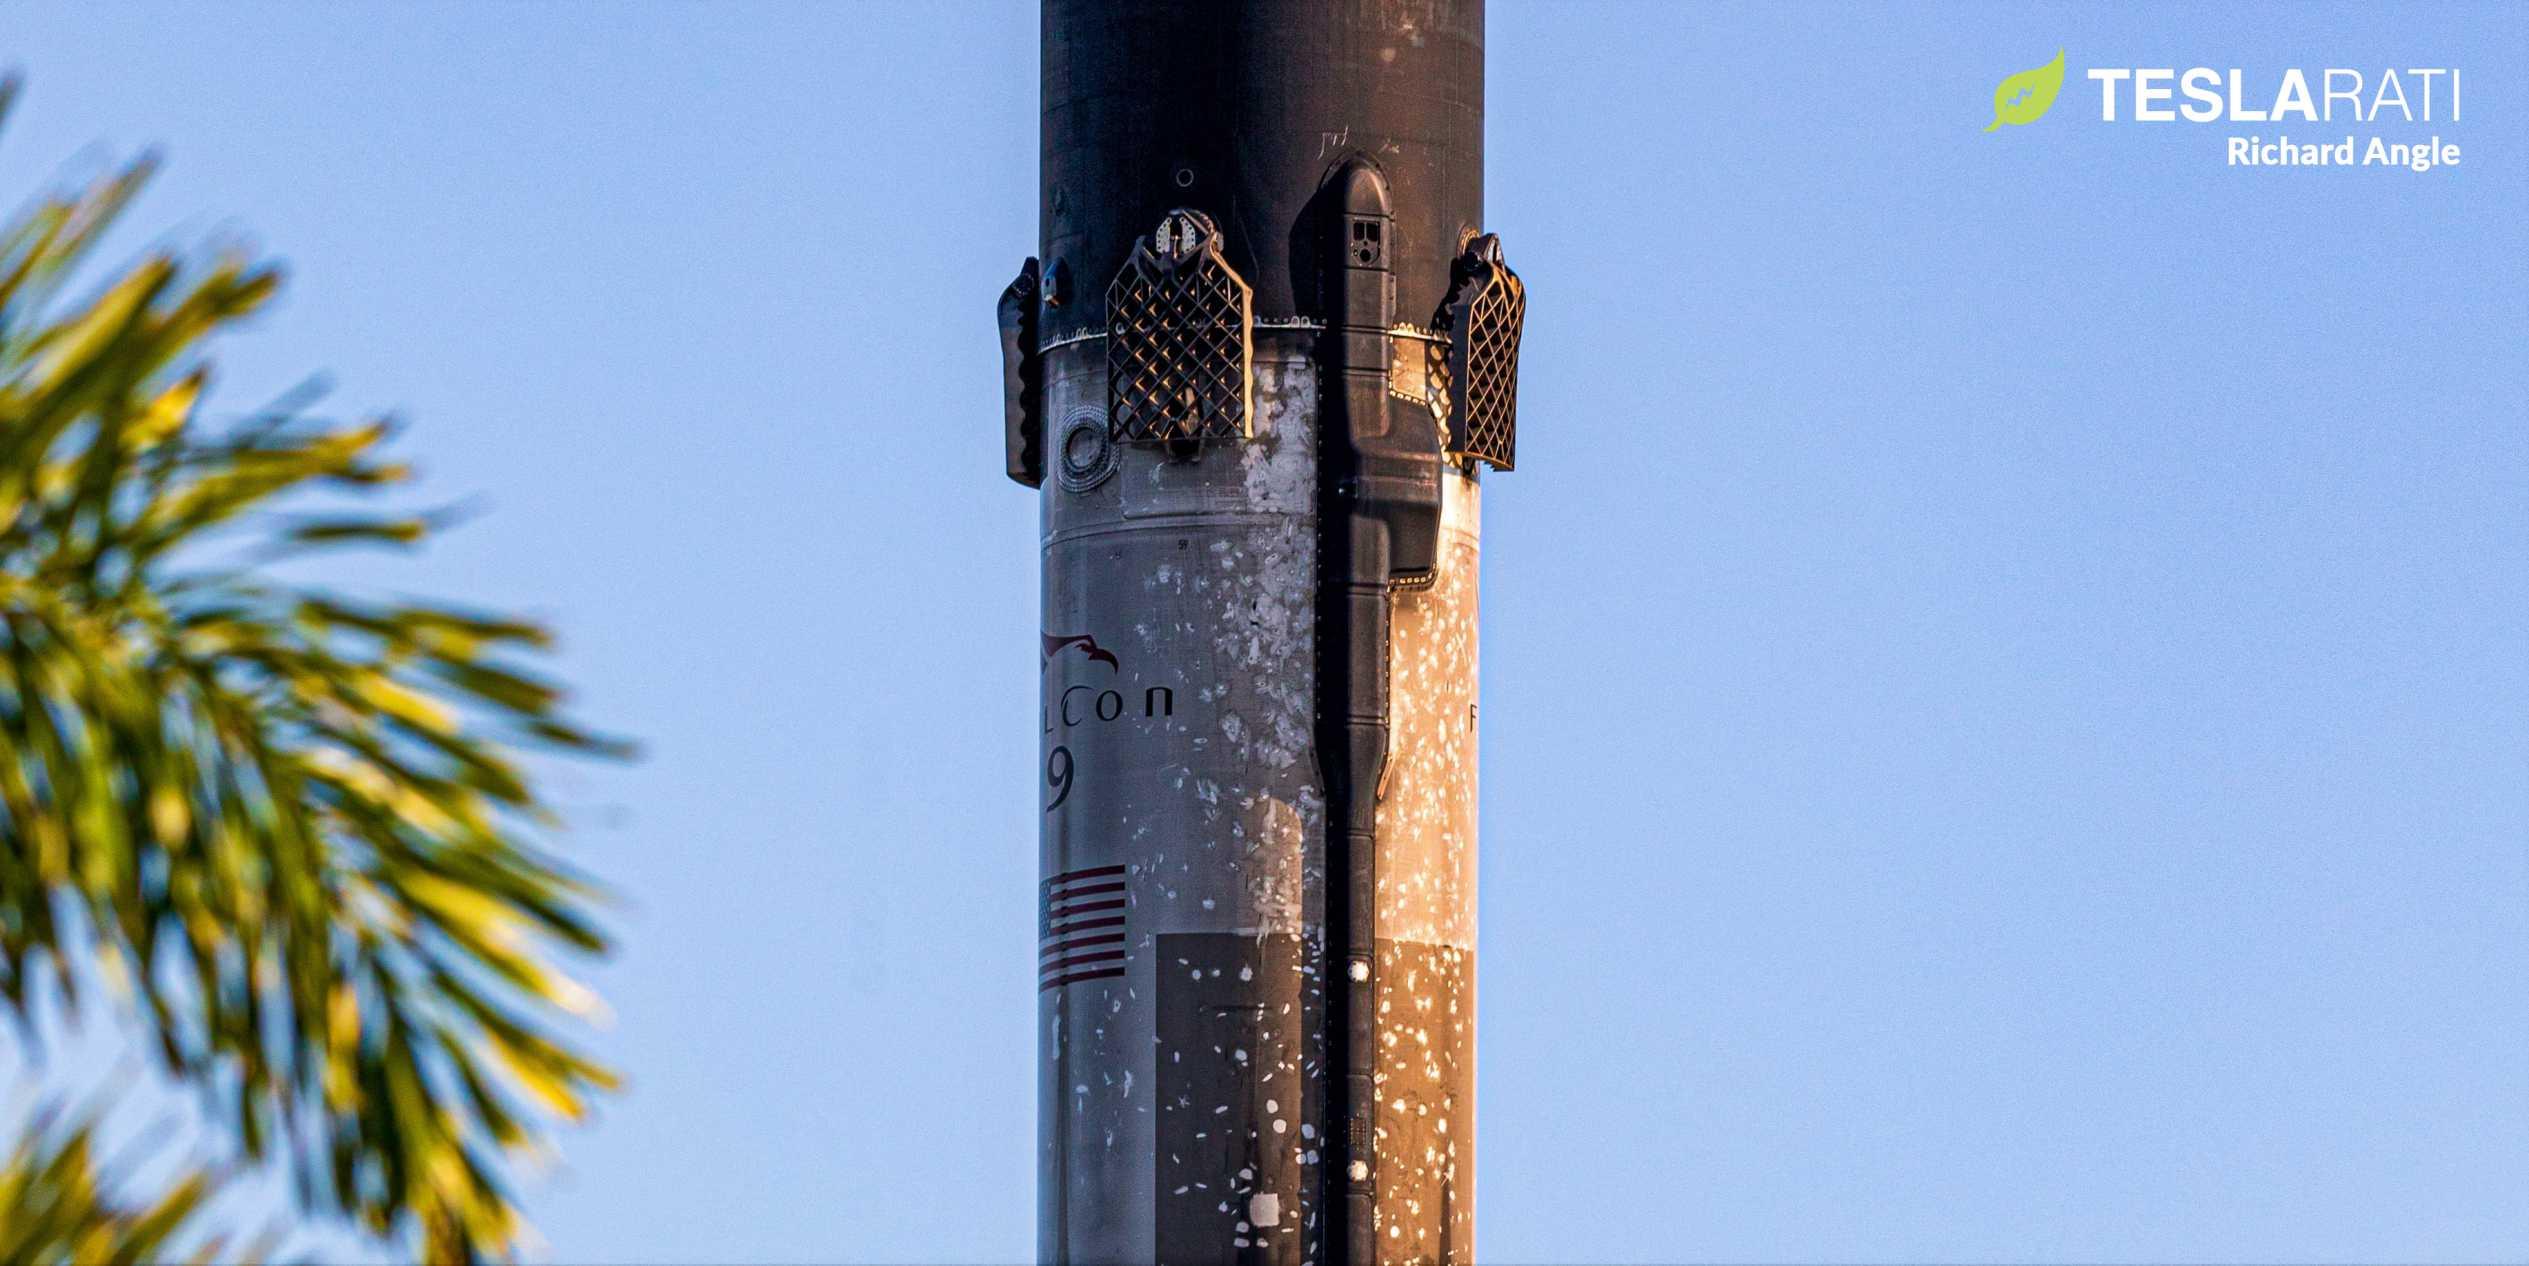 Starlink-8 Falcon 9 B1059 OCISLY return 061620 (Richard Angle) (2) crop (c)